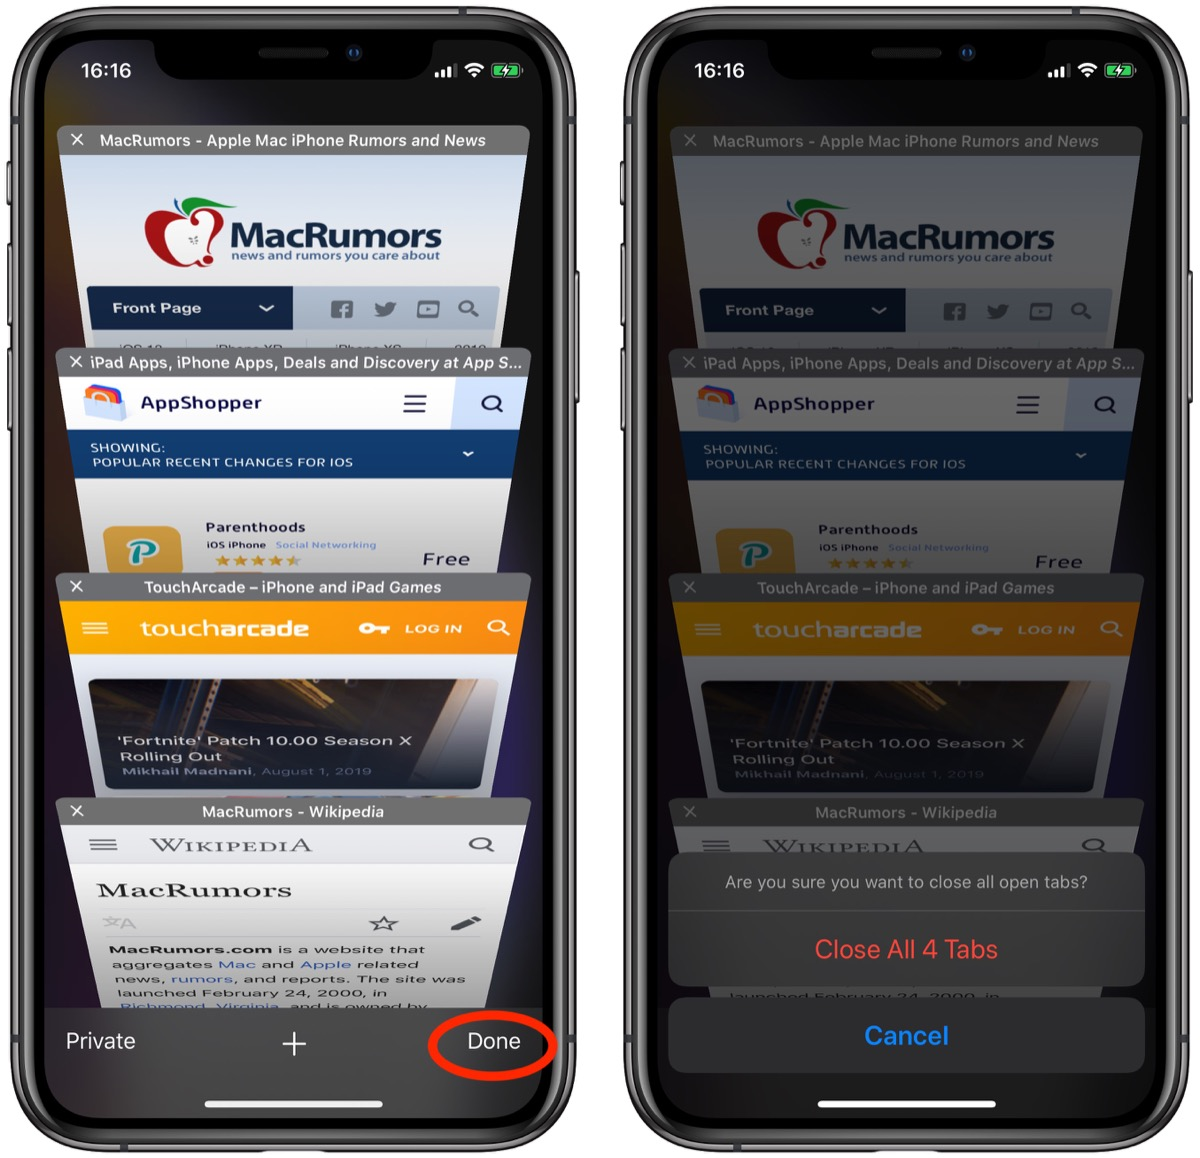 How to Configure iOS to Auto-Close Safari Browser Tabs